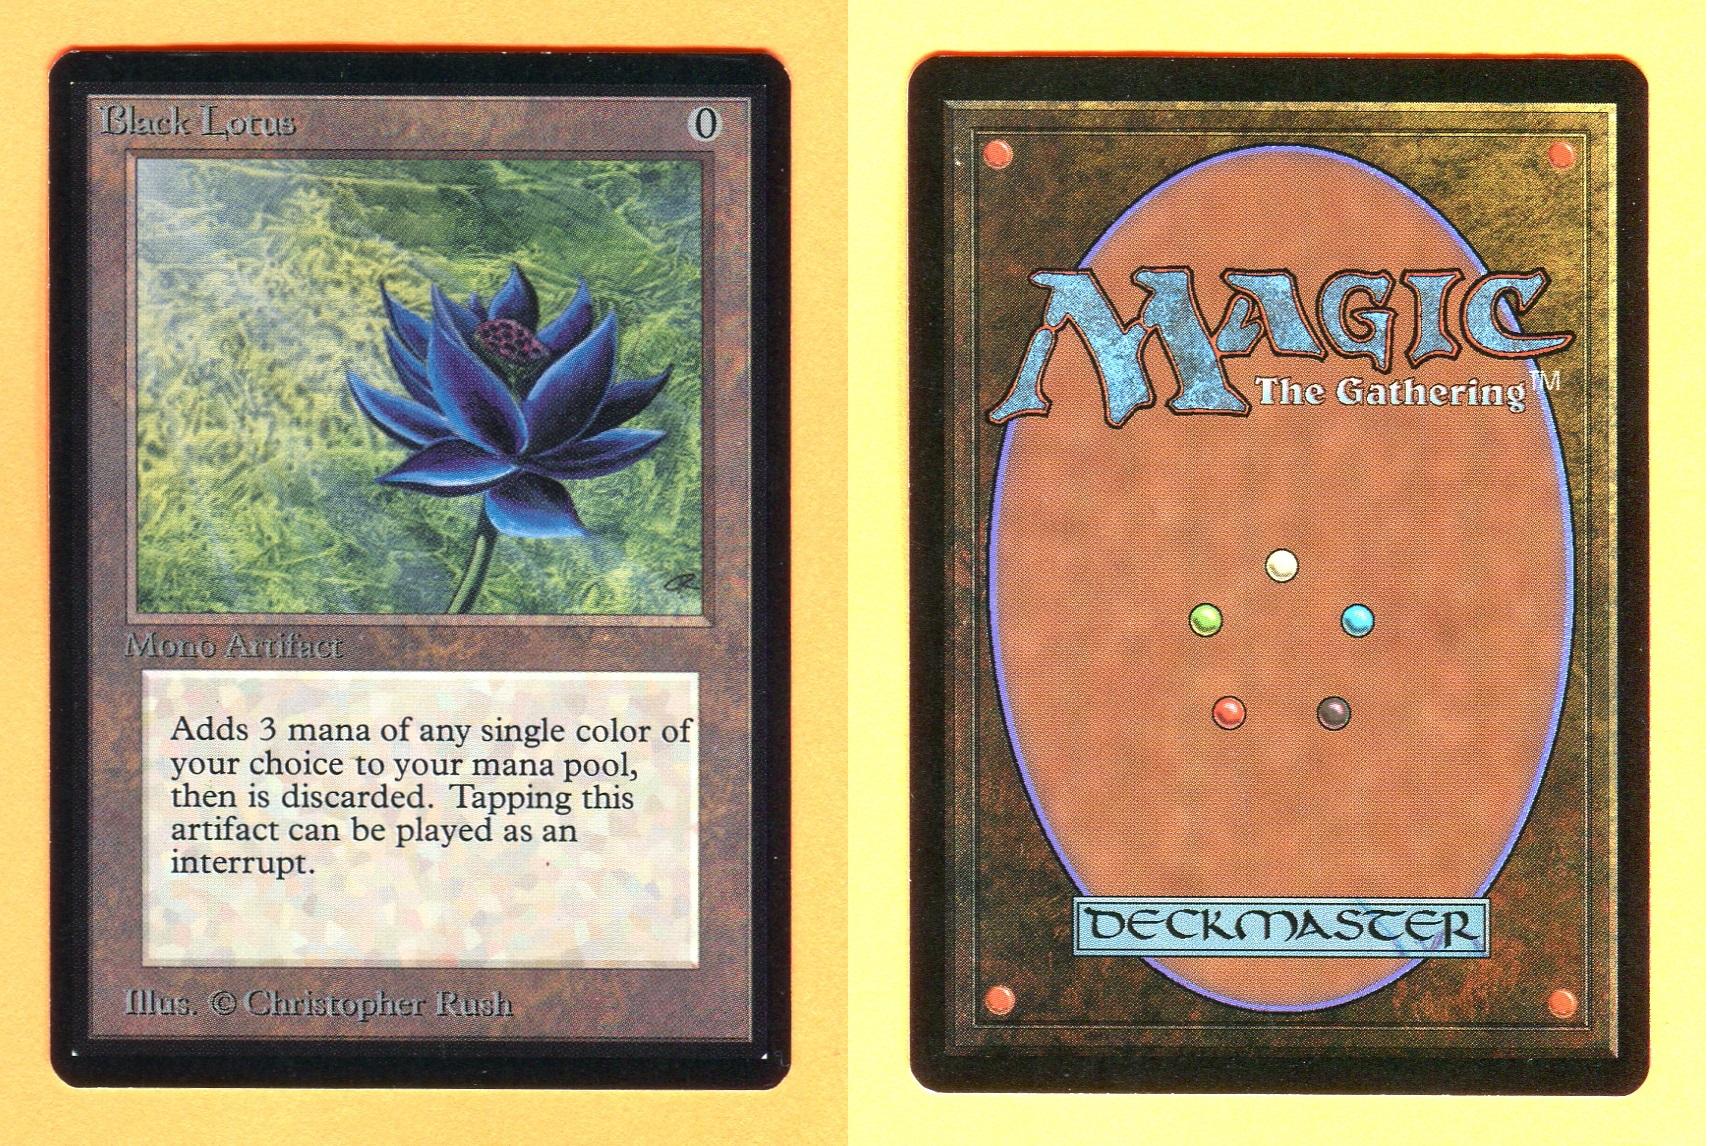 Black Lotus Magic